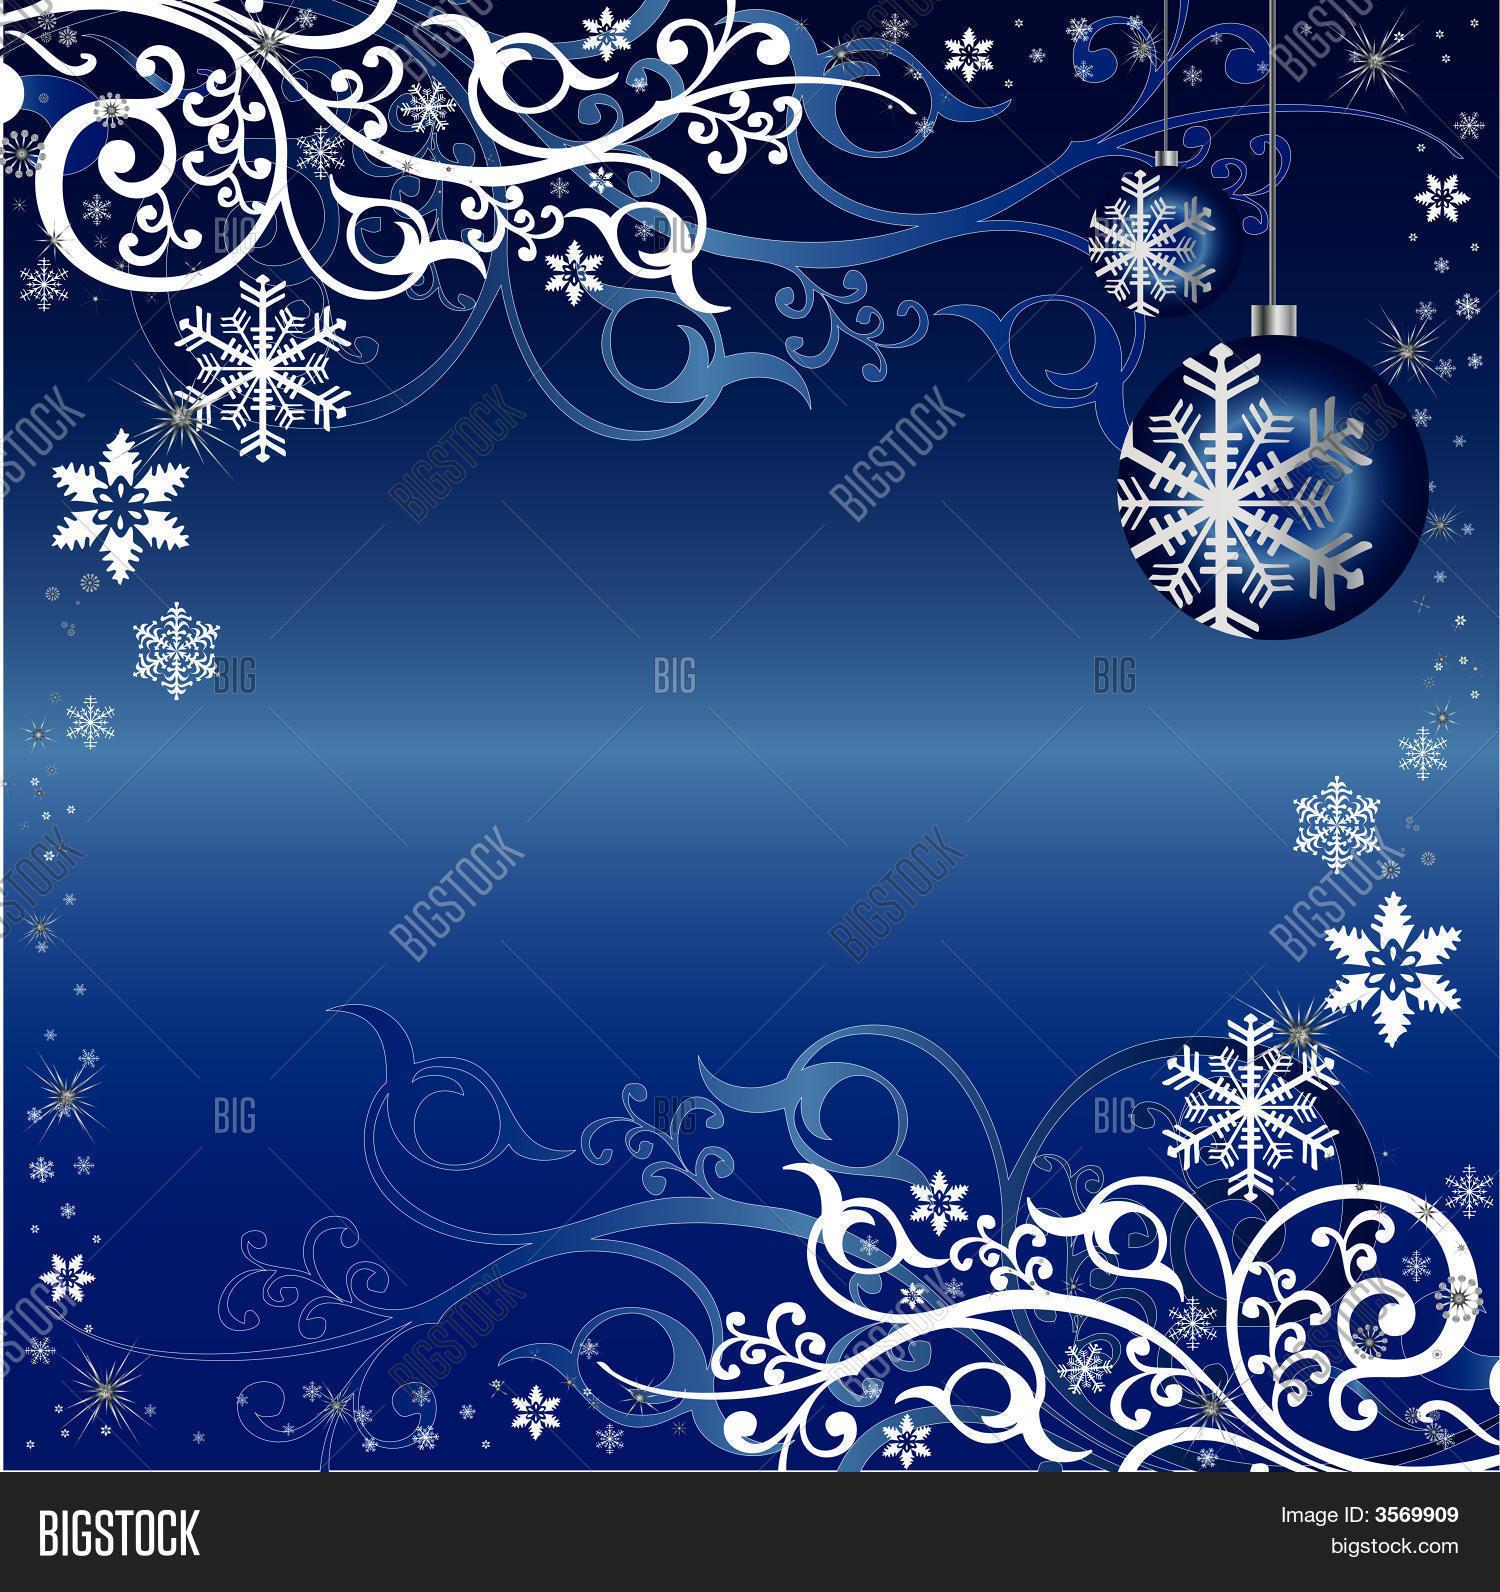 Blue White Christmas Themed Vector Photo Bigstock